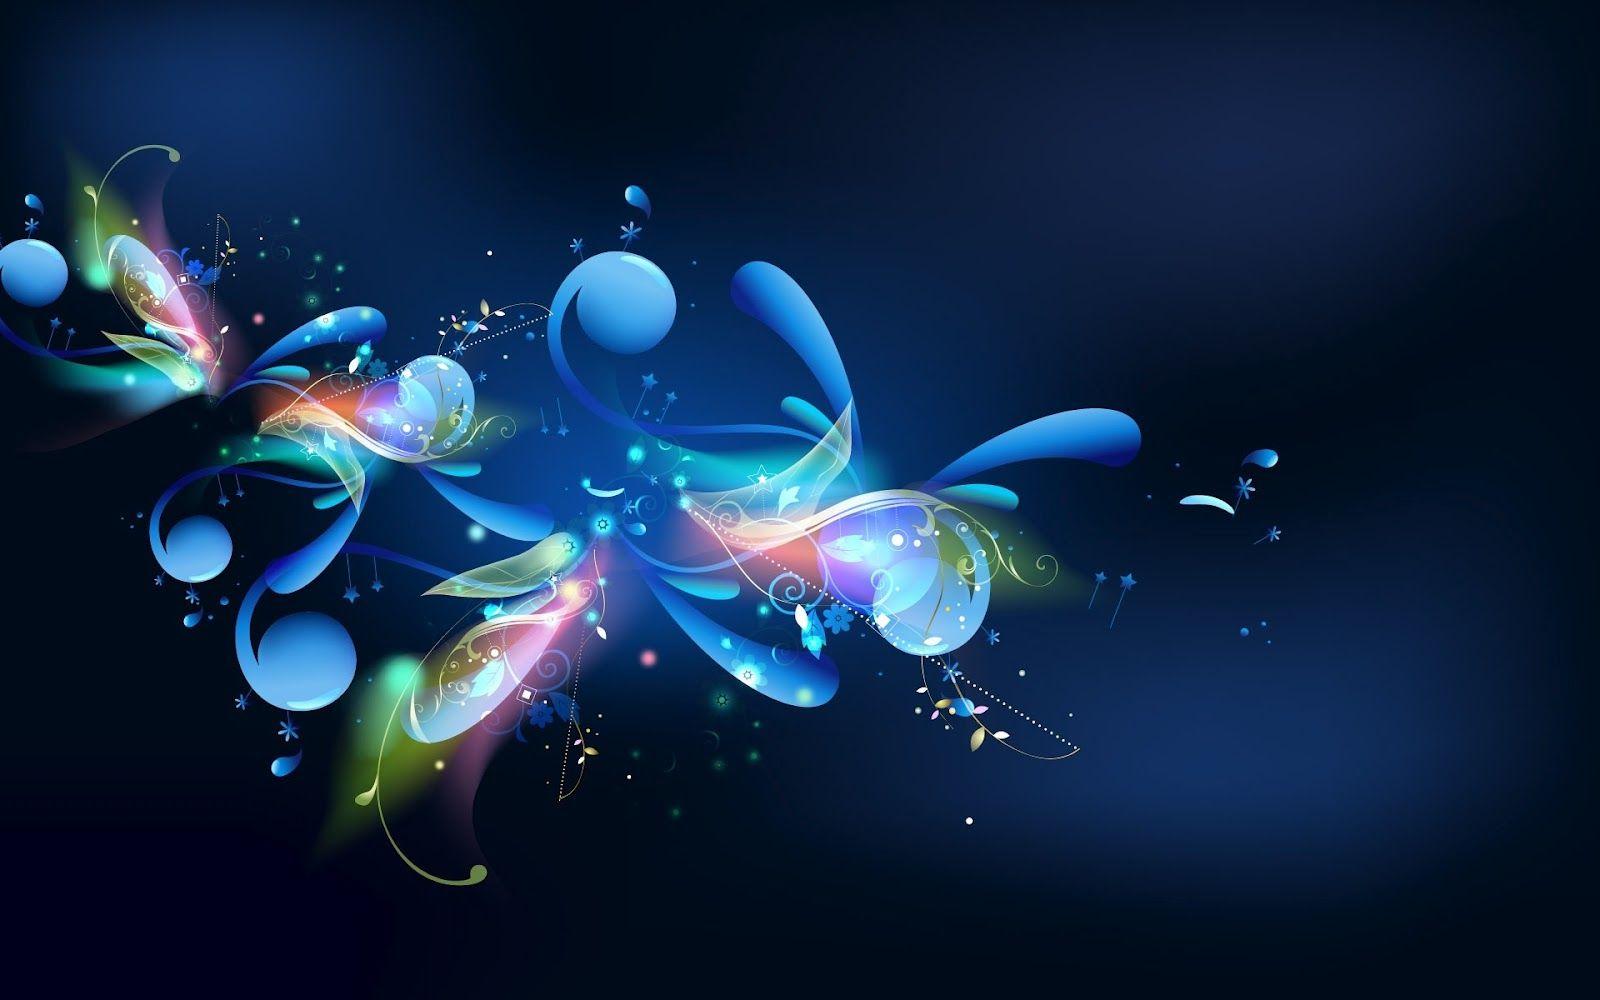 3d wallpaper hd 1080p free download,blue,water,graphic design,sky,font